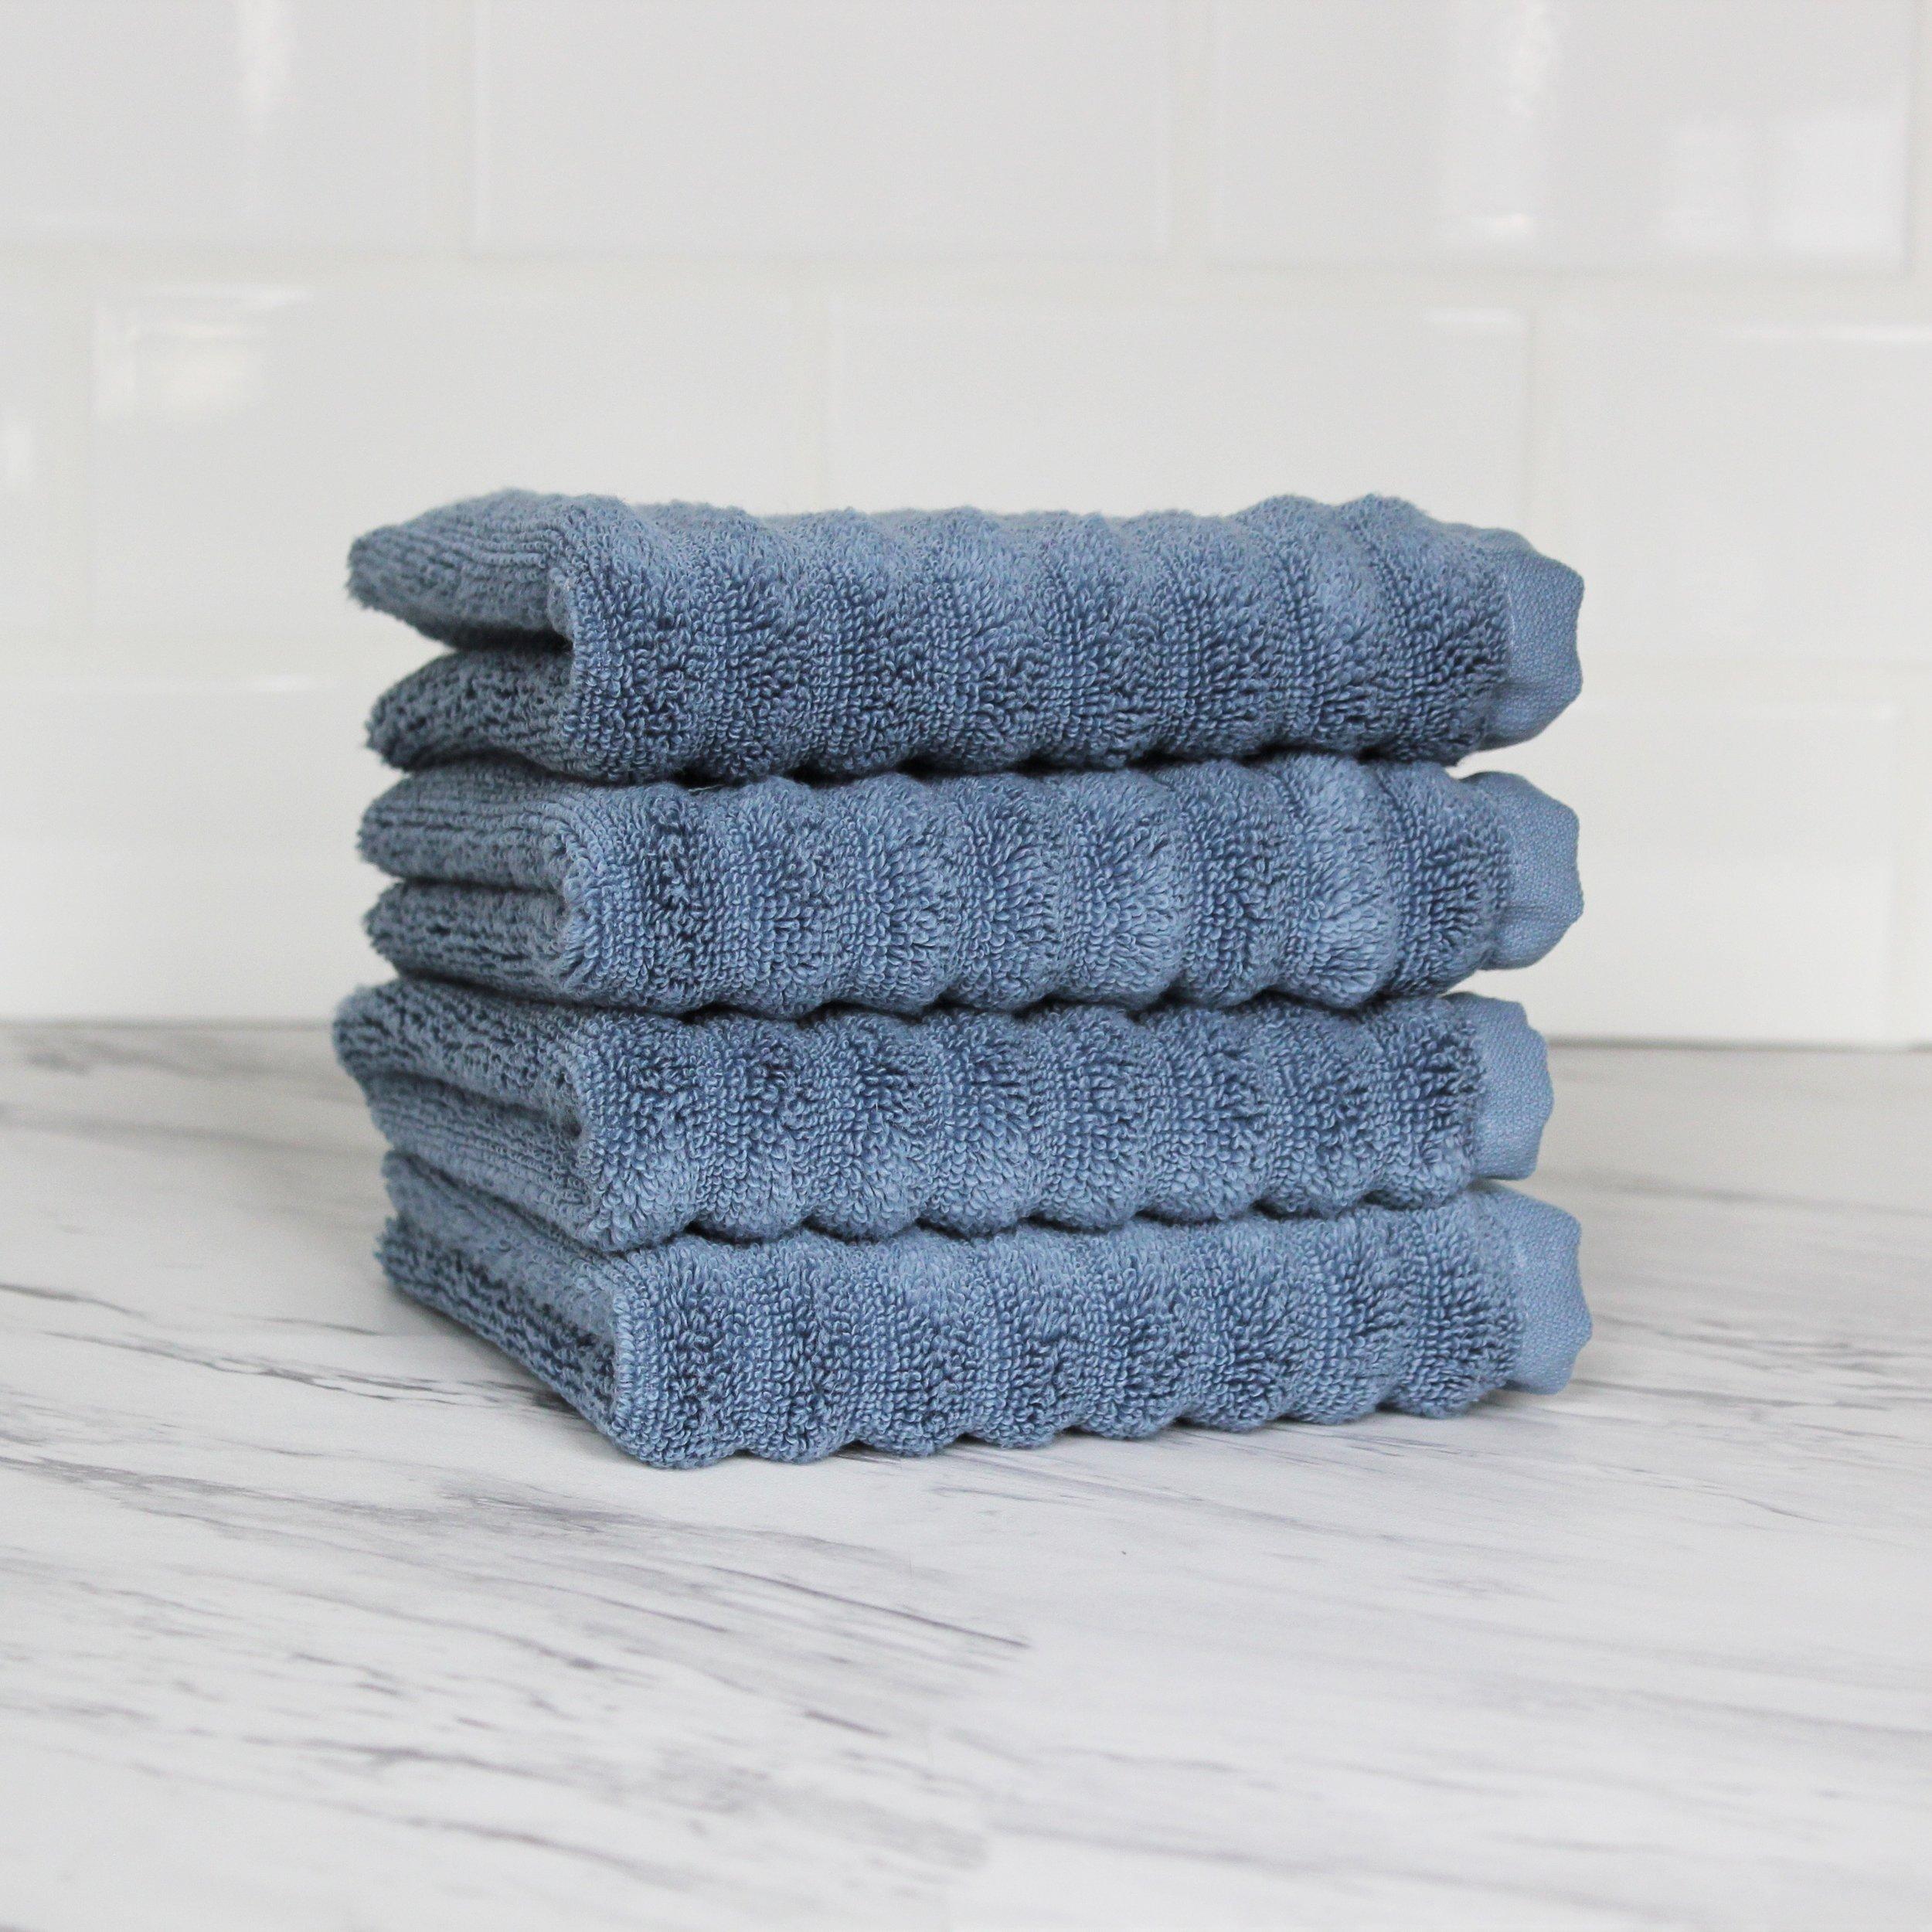 216703_100_turkish_zero_twist_cotton_4pc_wash_towel_set_slate_blue.jpg